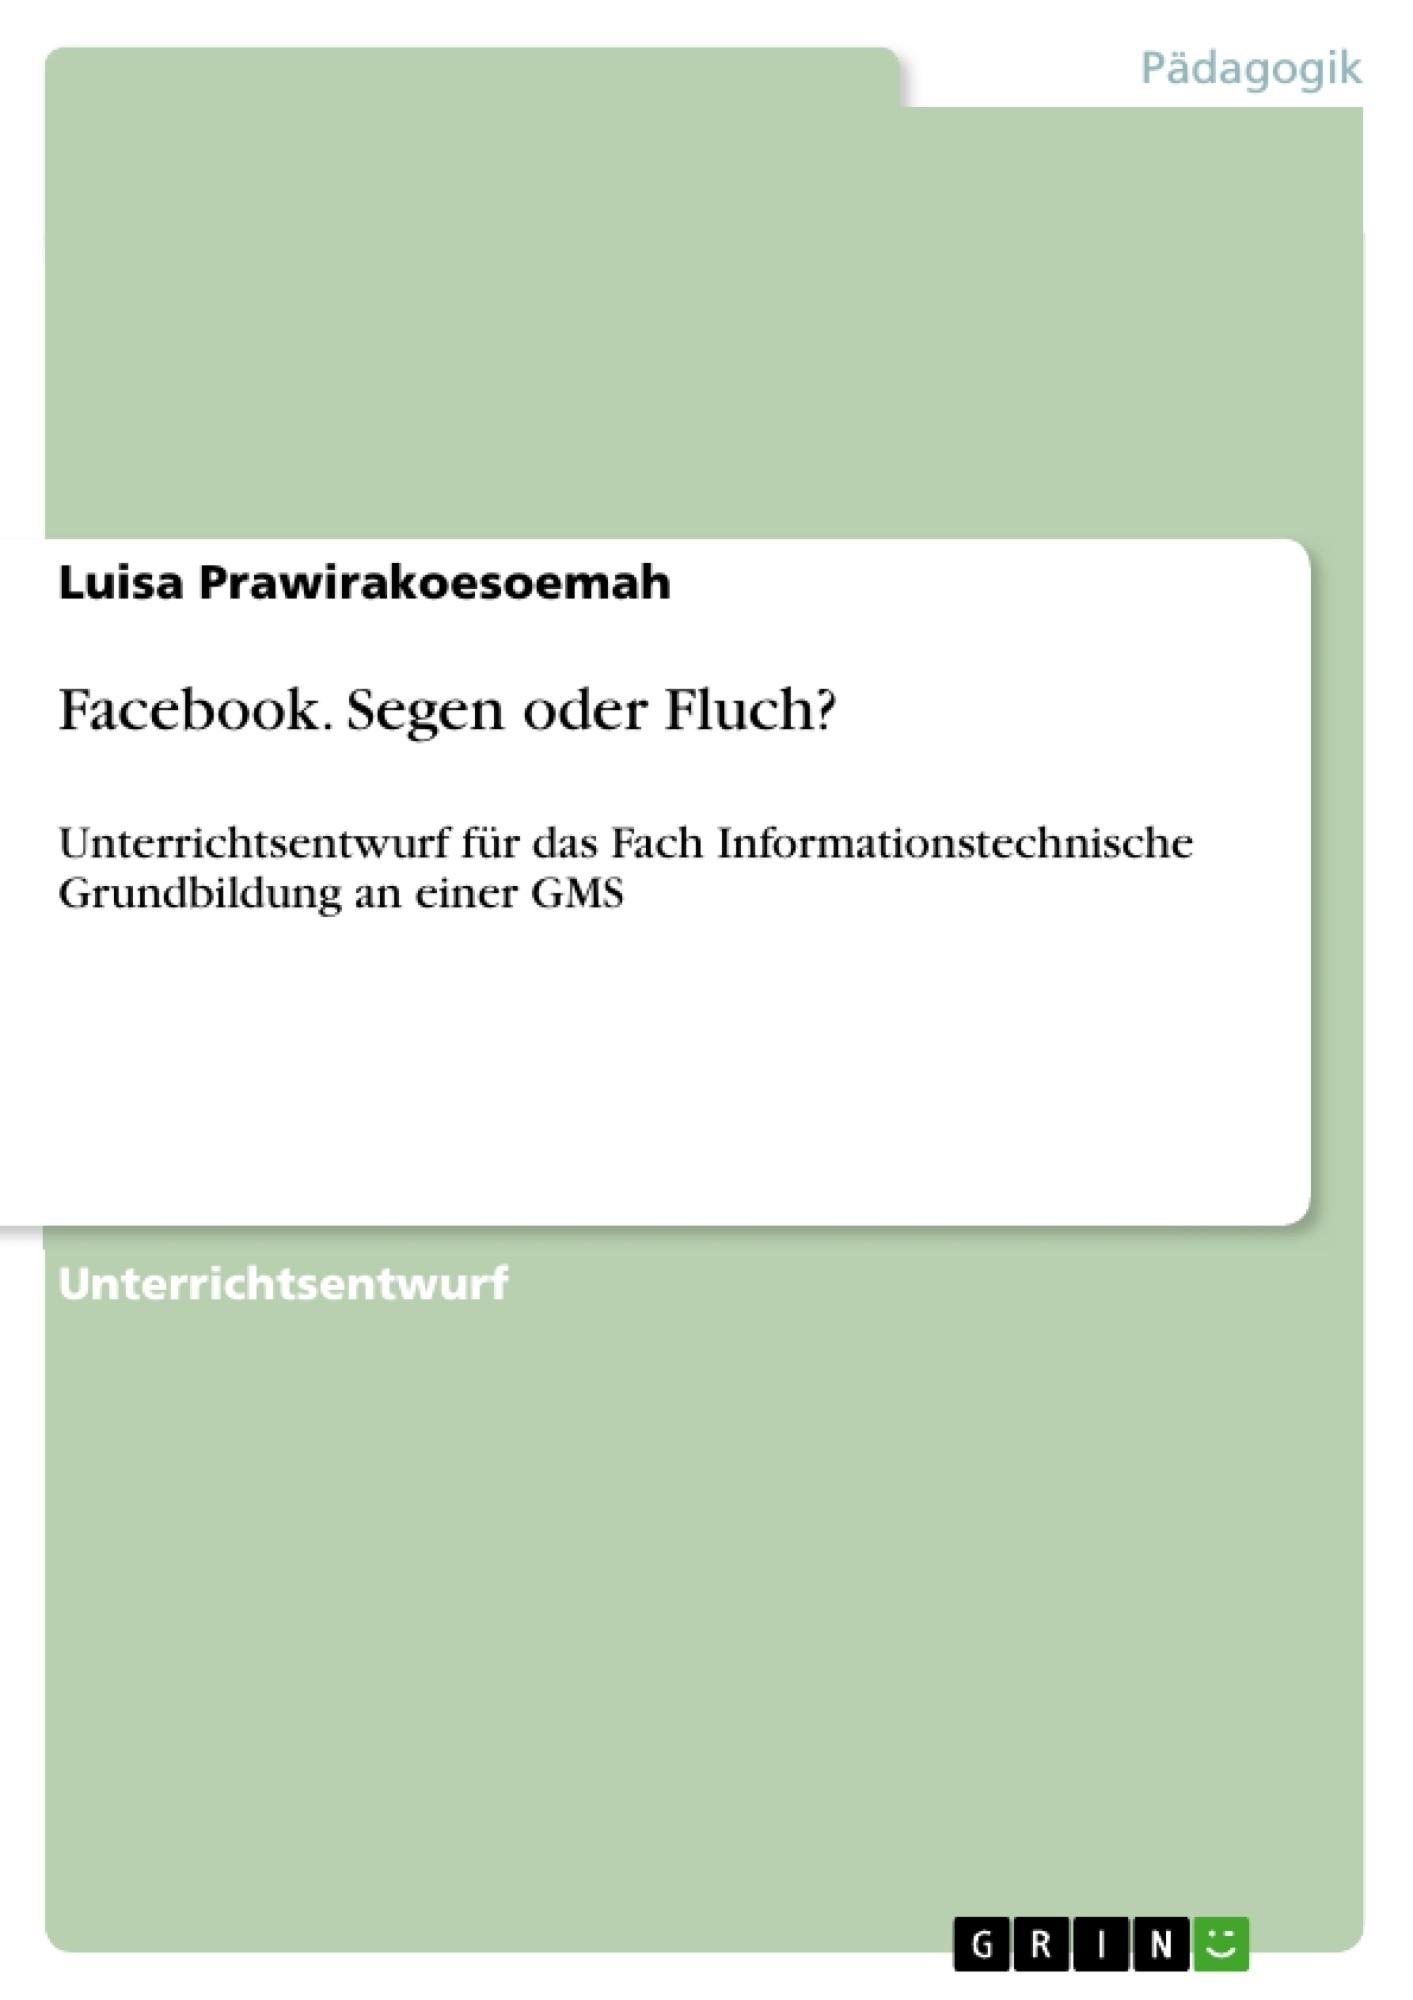 Titel: Facebook. Segen oder Fluch?